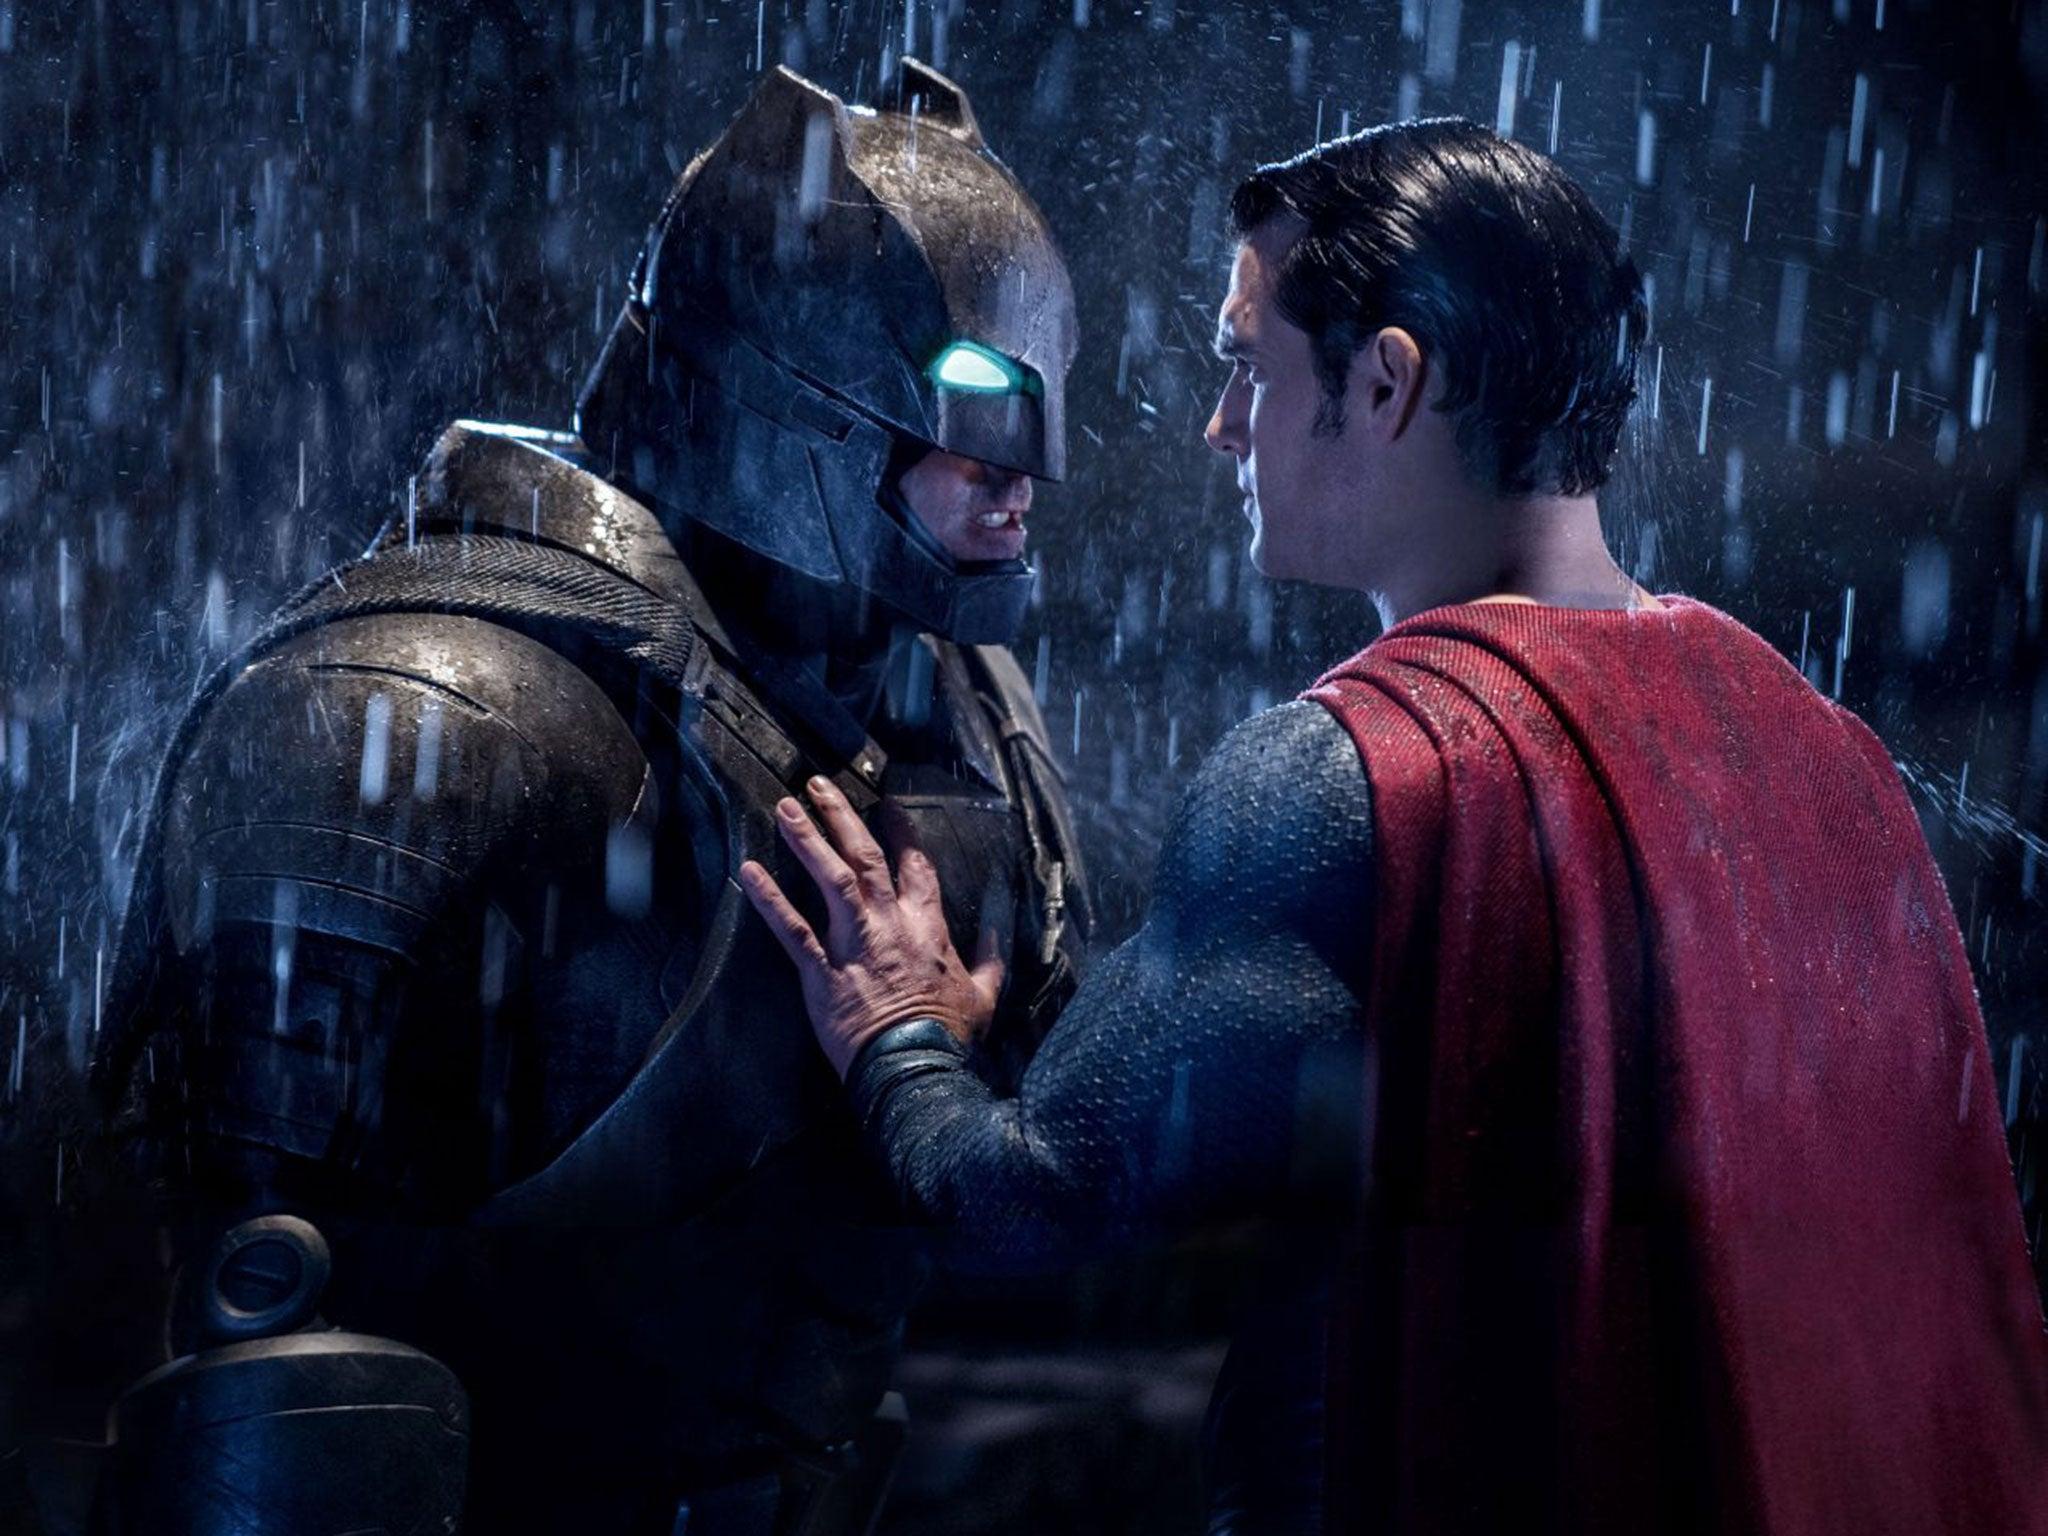 Batman V Superman Ben Affleck Finally Responds To Negative - 14 hilarious pictures of sad batman